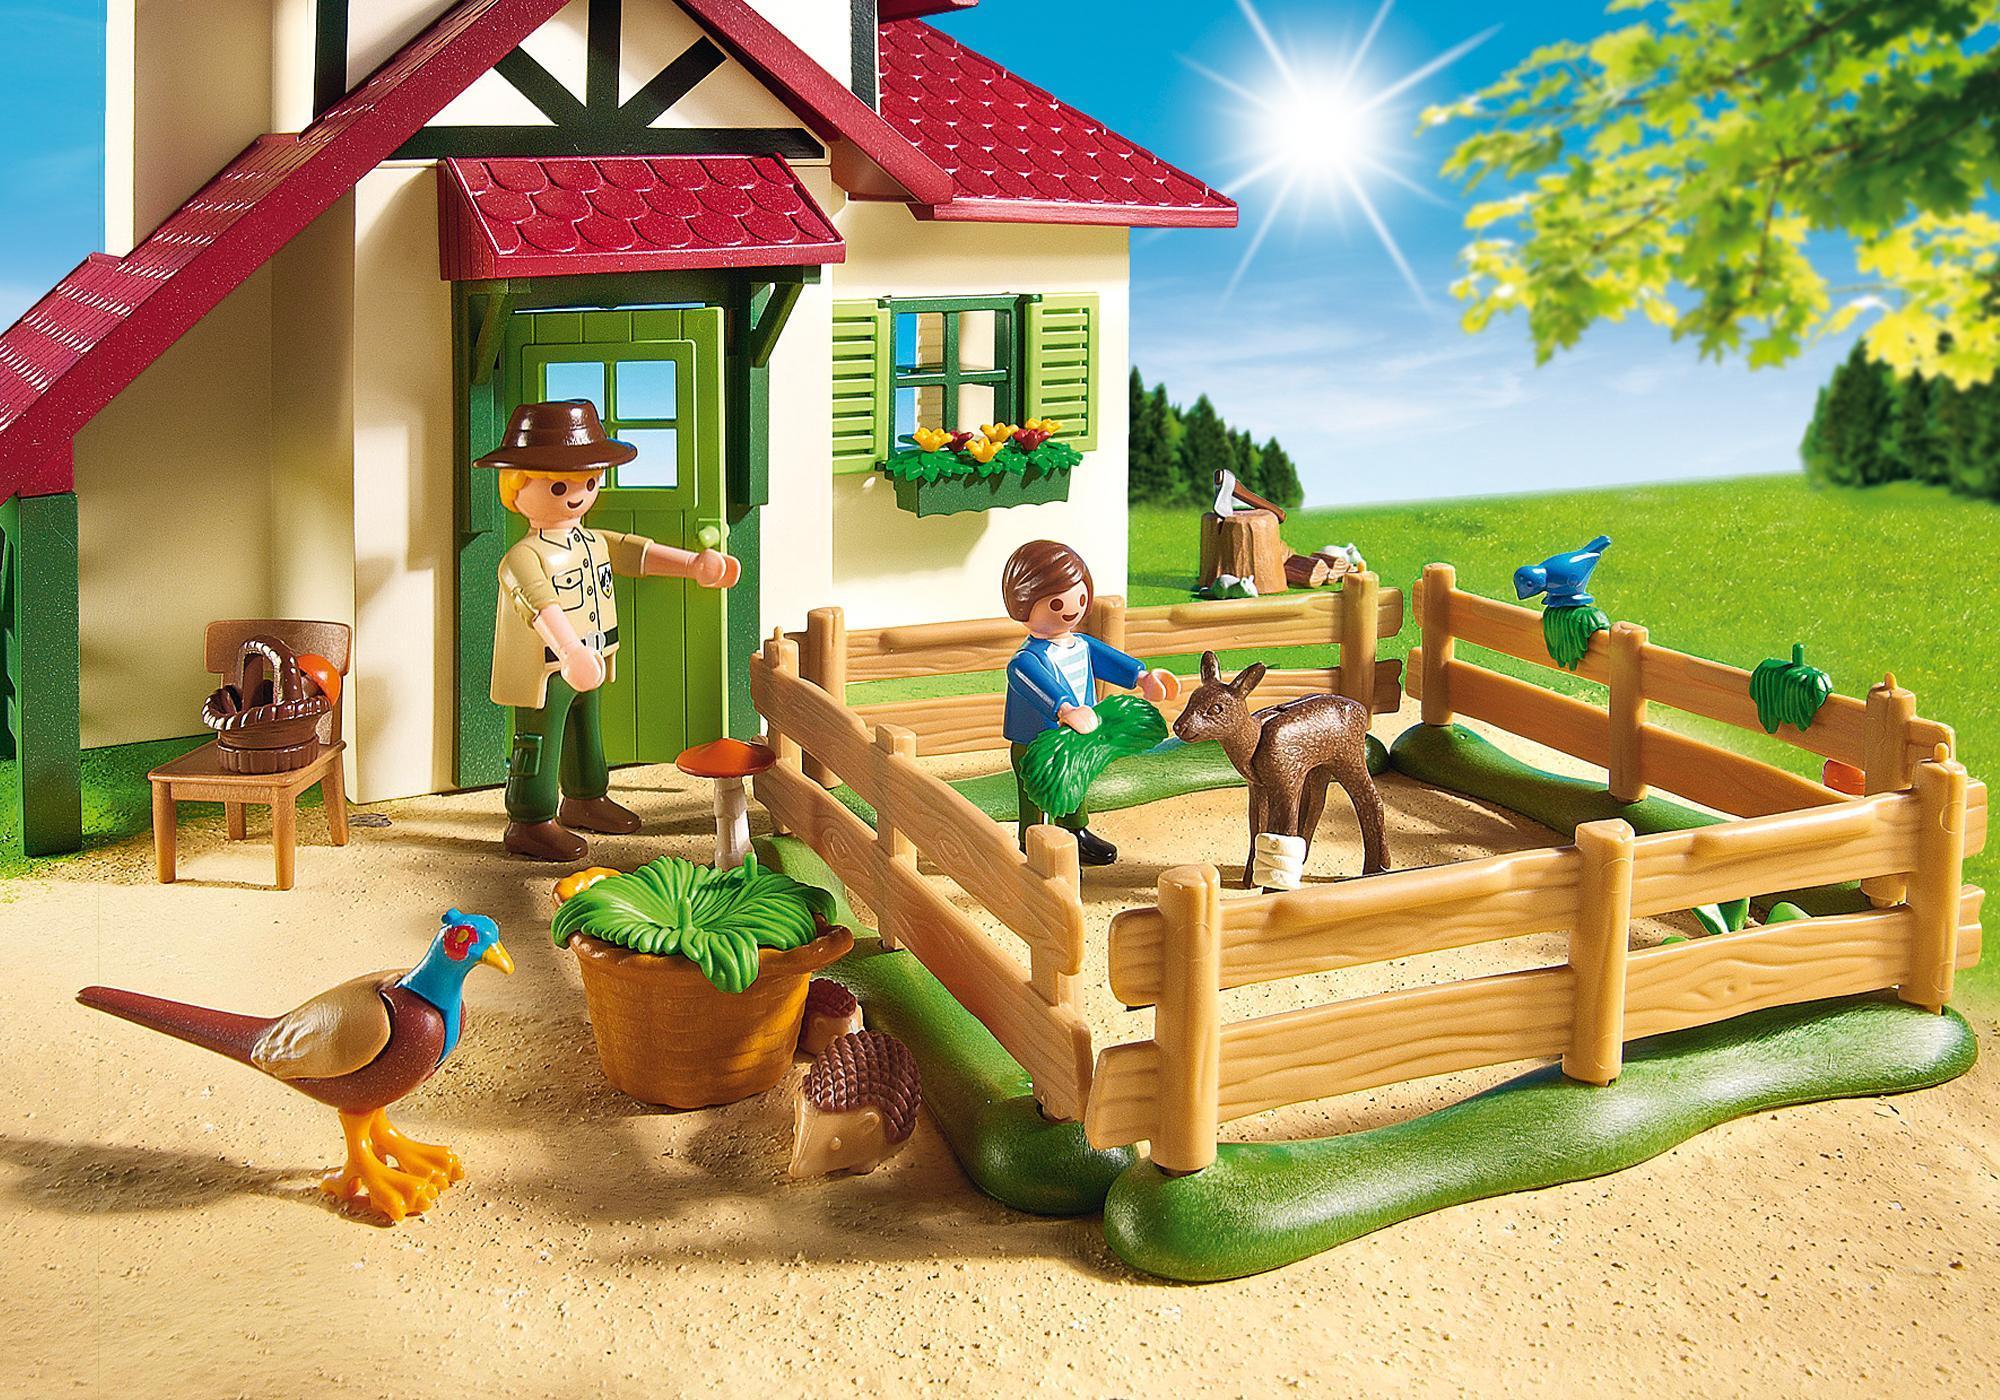 http://media.playmobil.com/i/playmobil/6811_product_extra2/Domek leśniczego